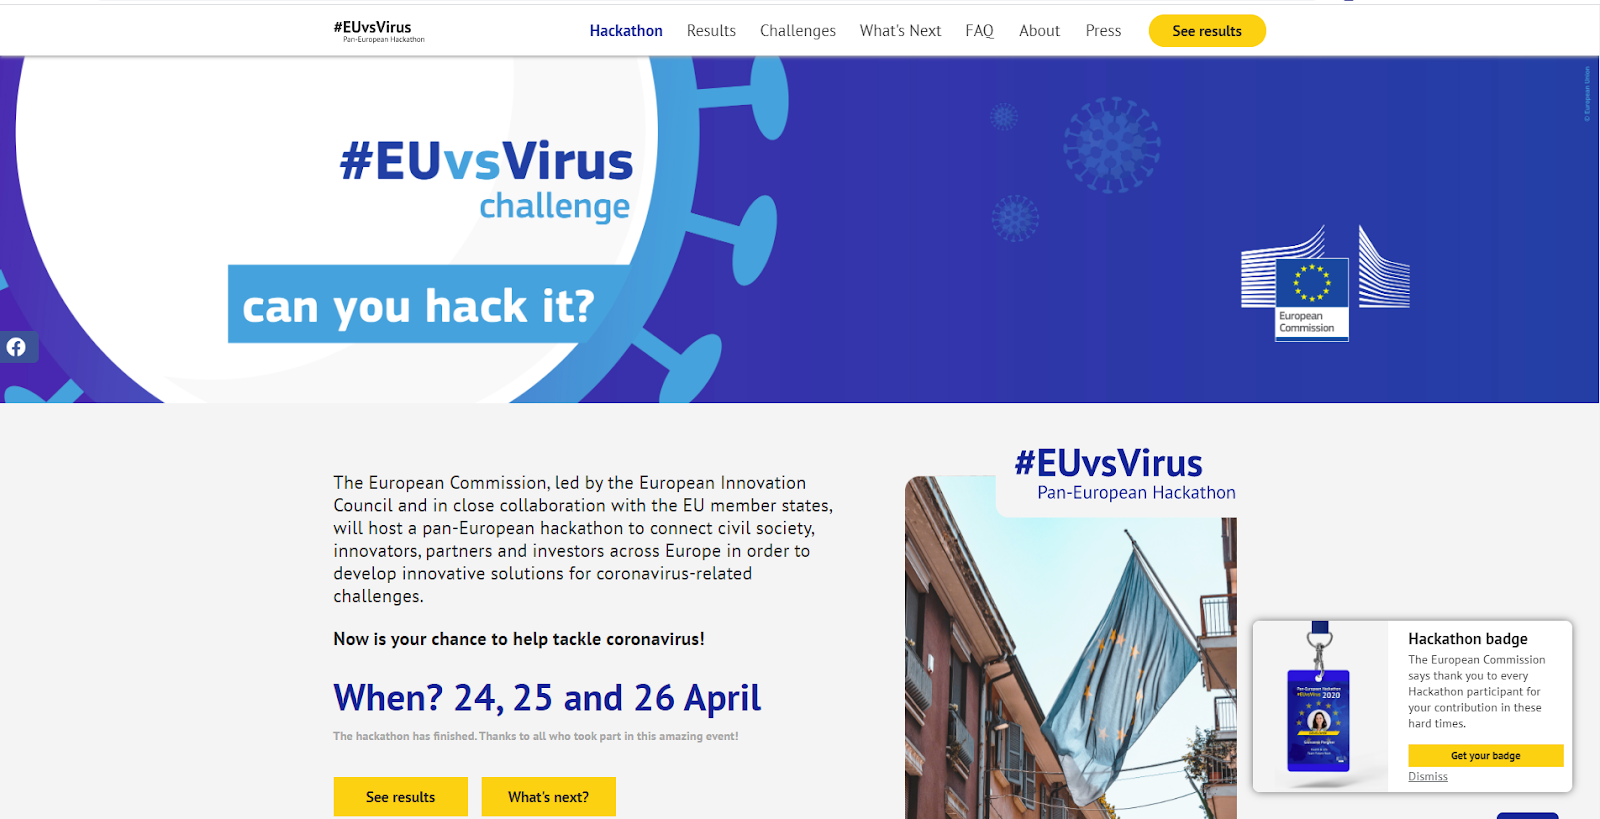 EUvsVirus landing page